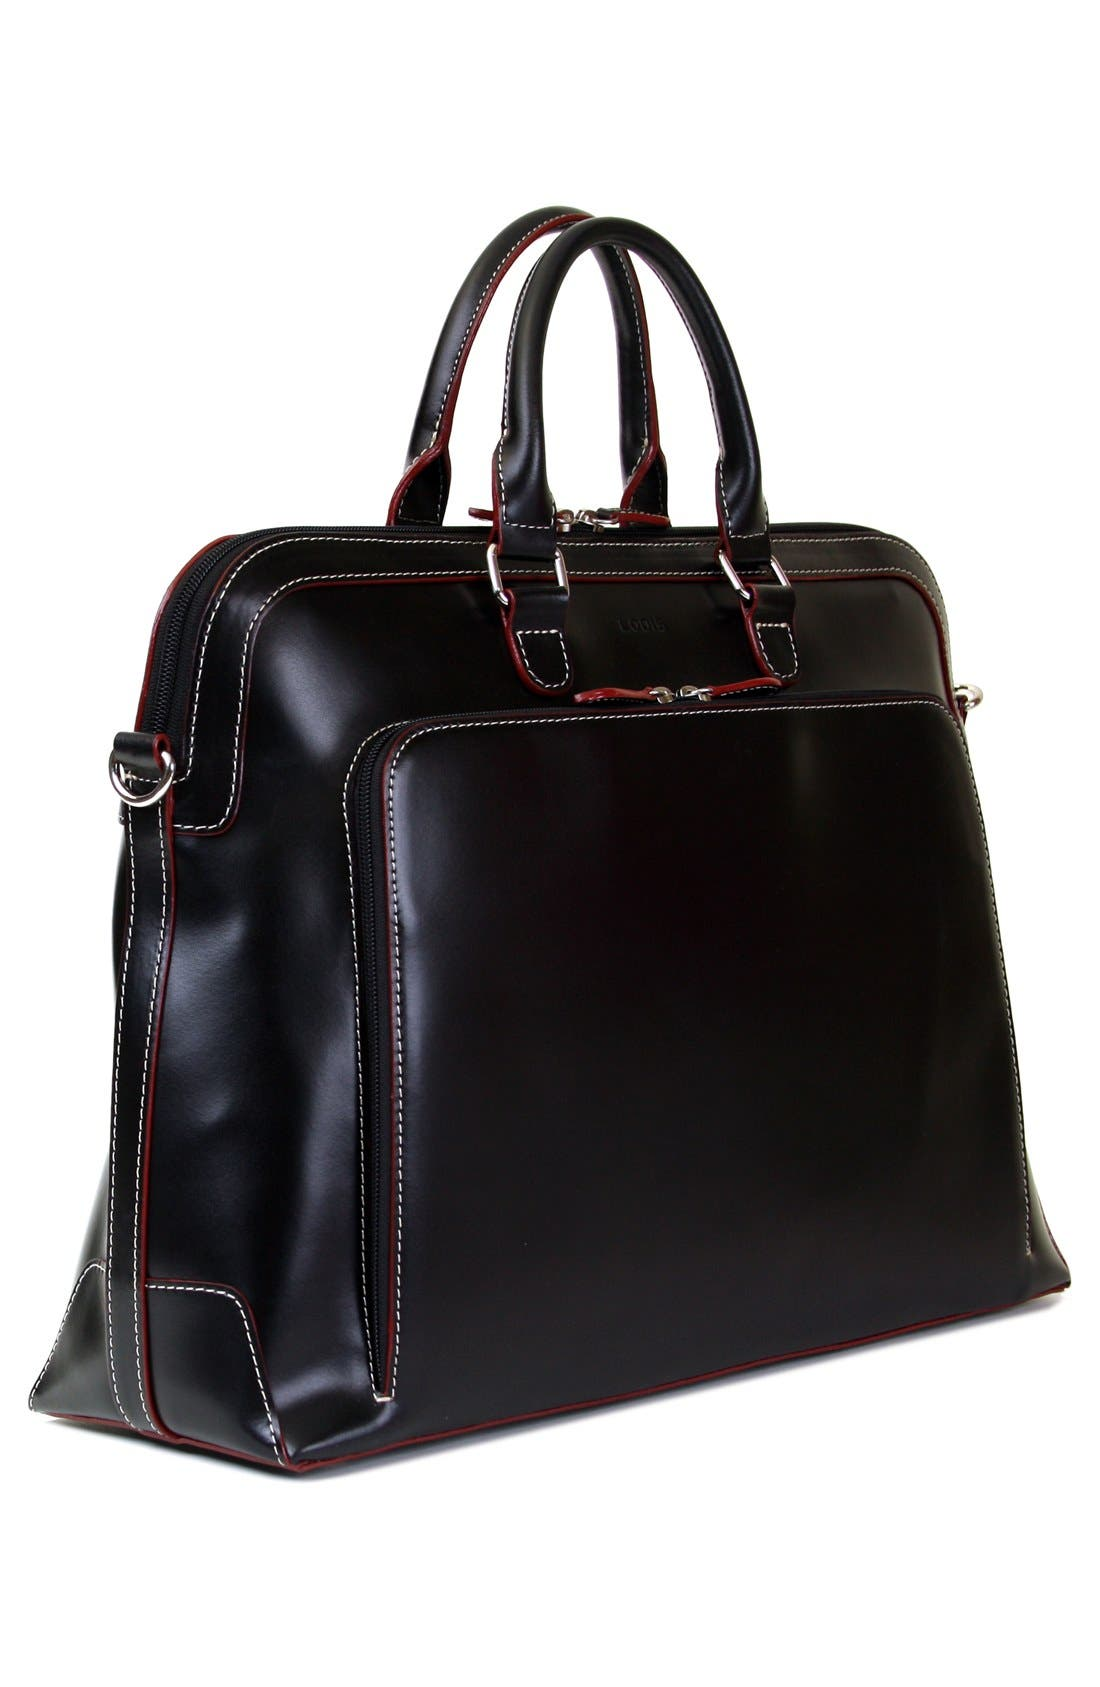 Lodis 'Audrey Brera' Leather Briefcase,                             Alternate thumbnail 6, color,                             001